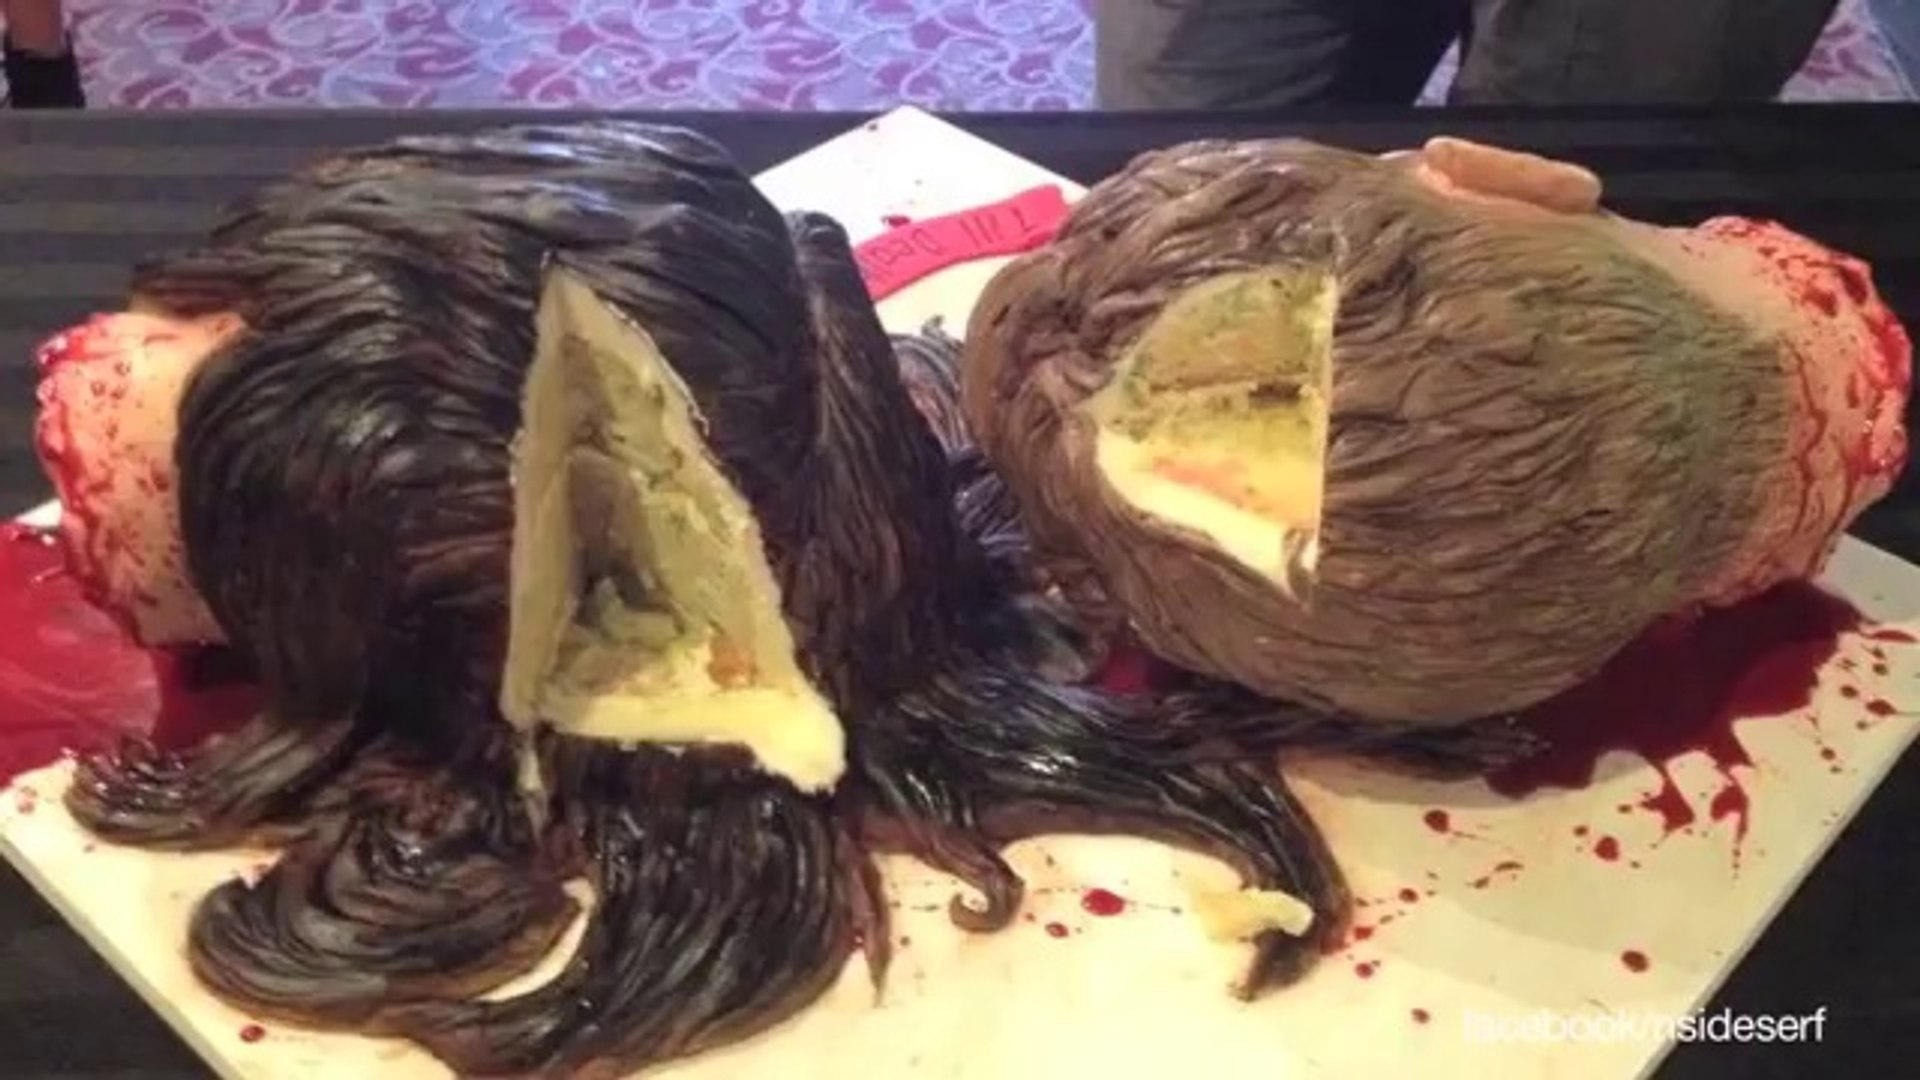 Cake Artist Designs Severed Head Cake